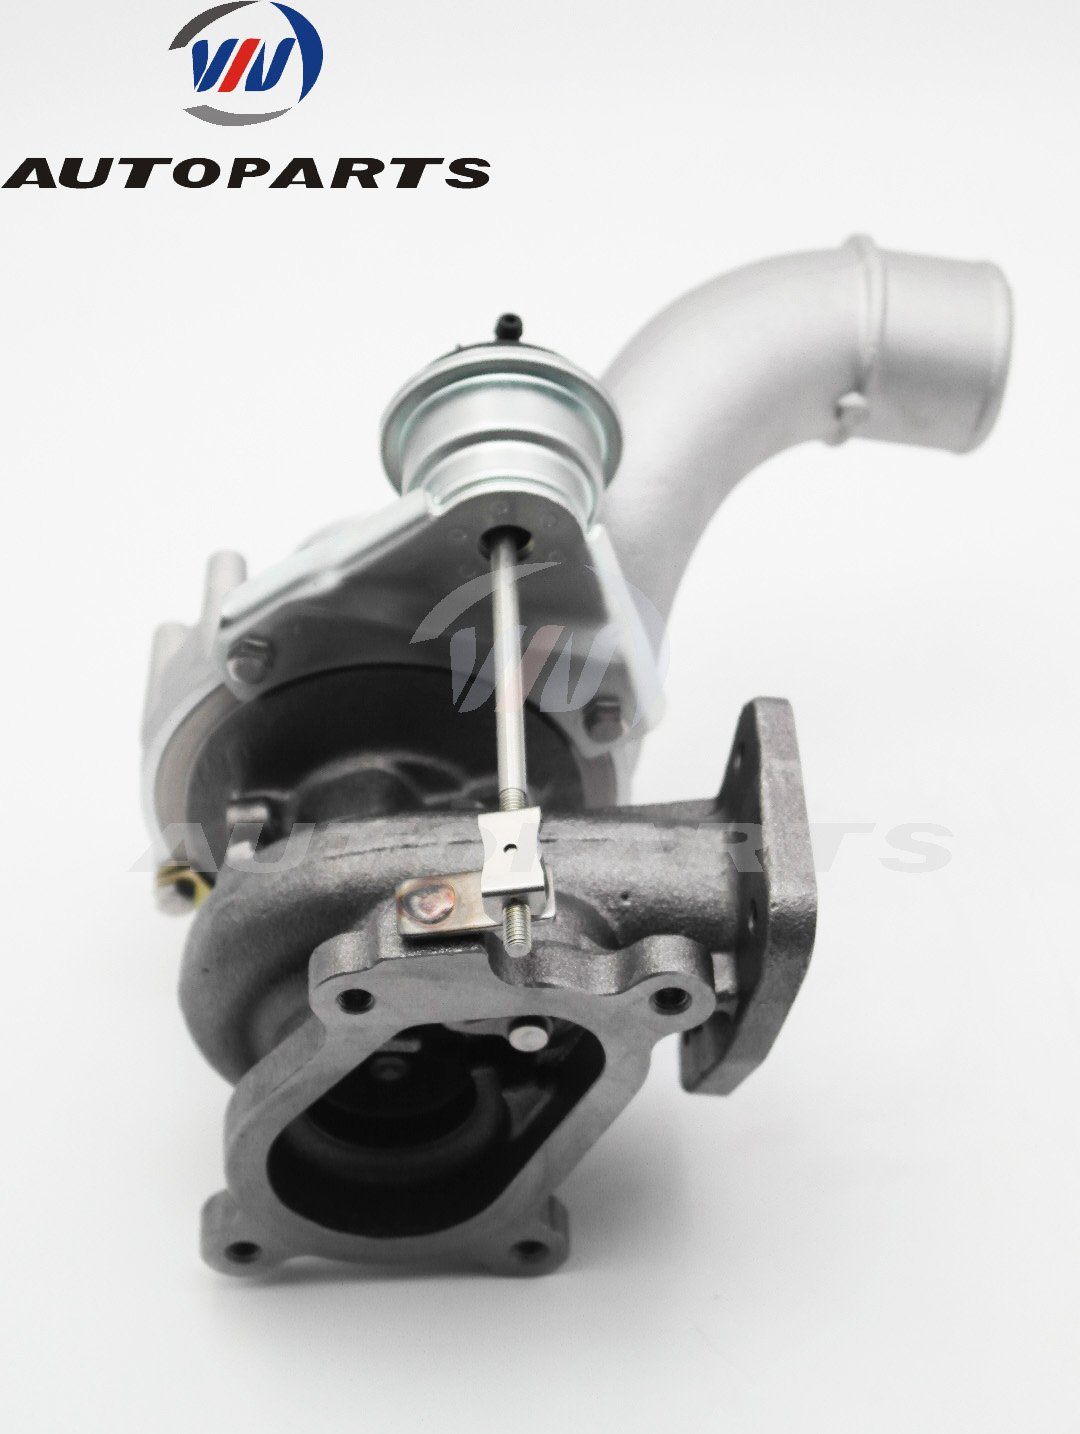 Amazon.com: Turbocharger 53039880055 for Nissan Opel Renault varies 2.5L Diesel Engine: Automotive